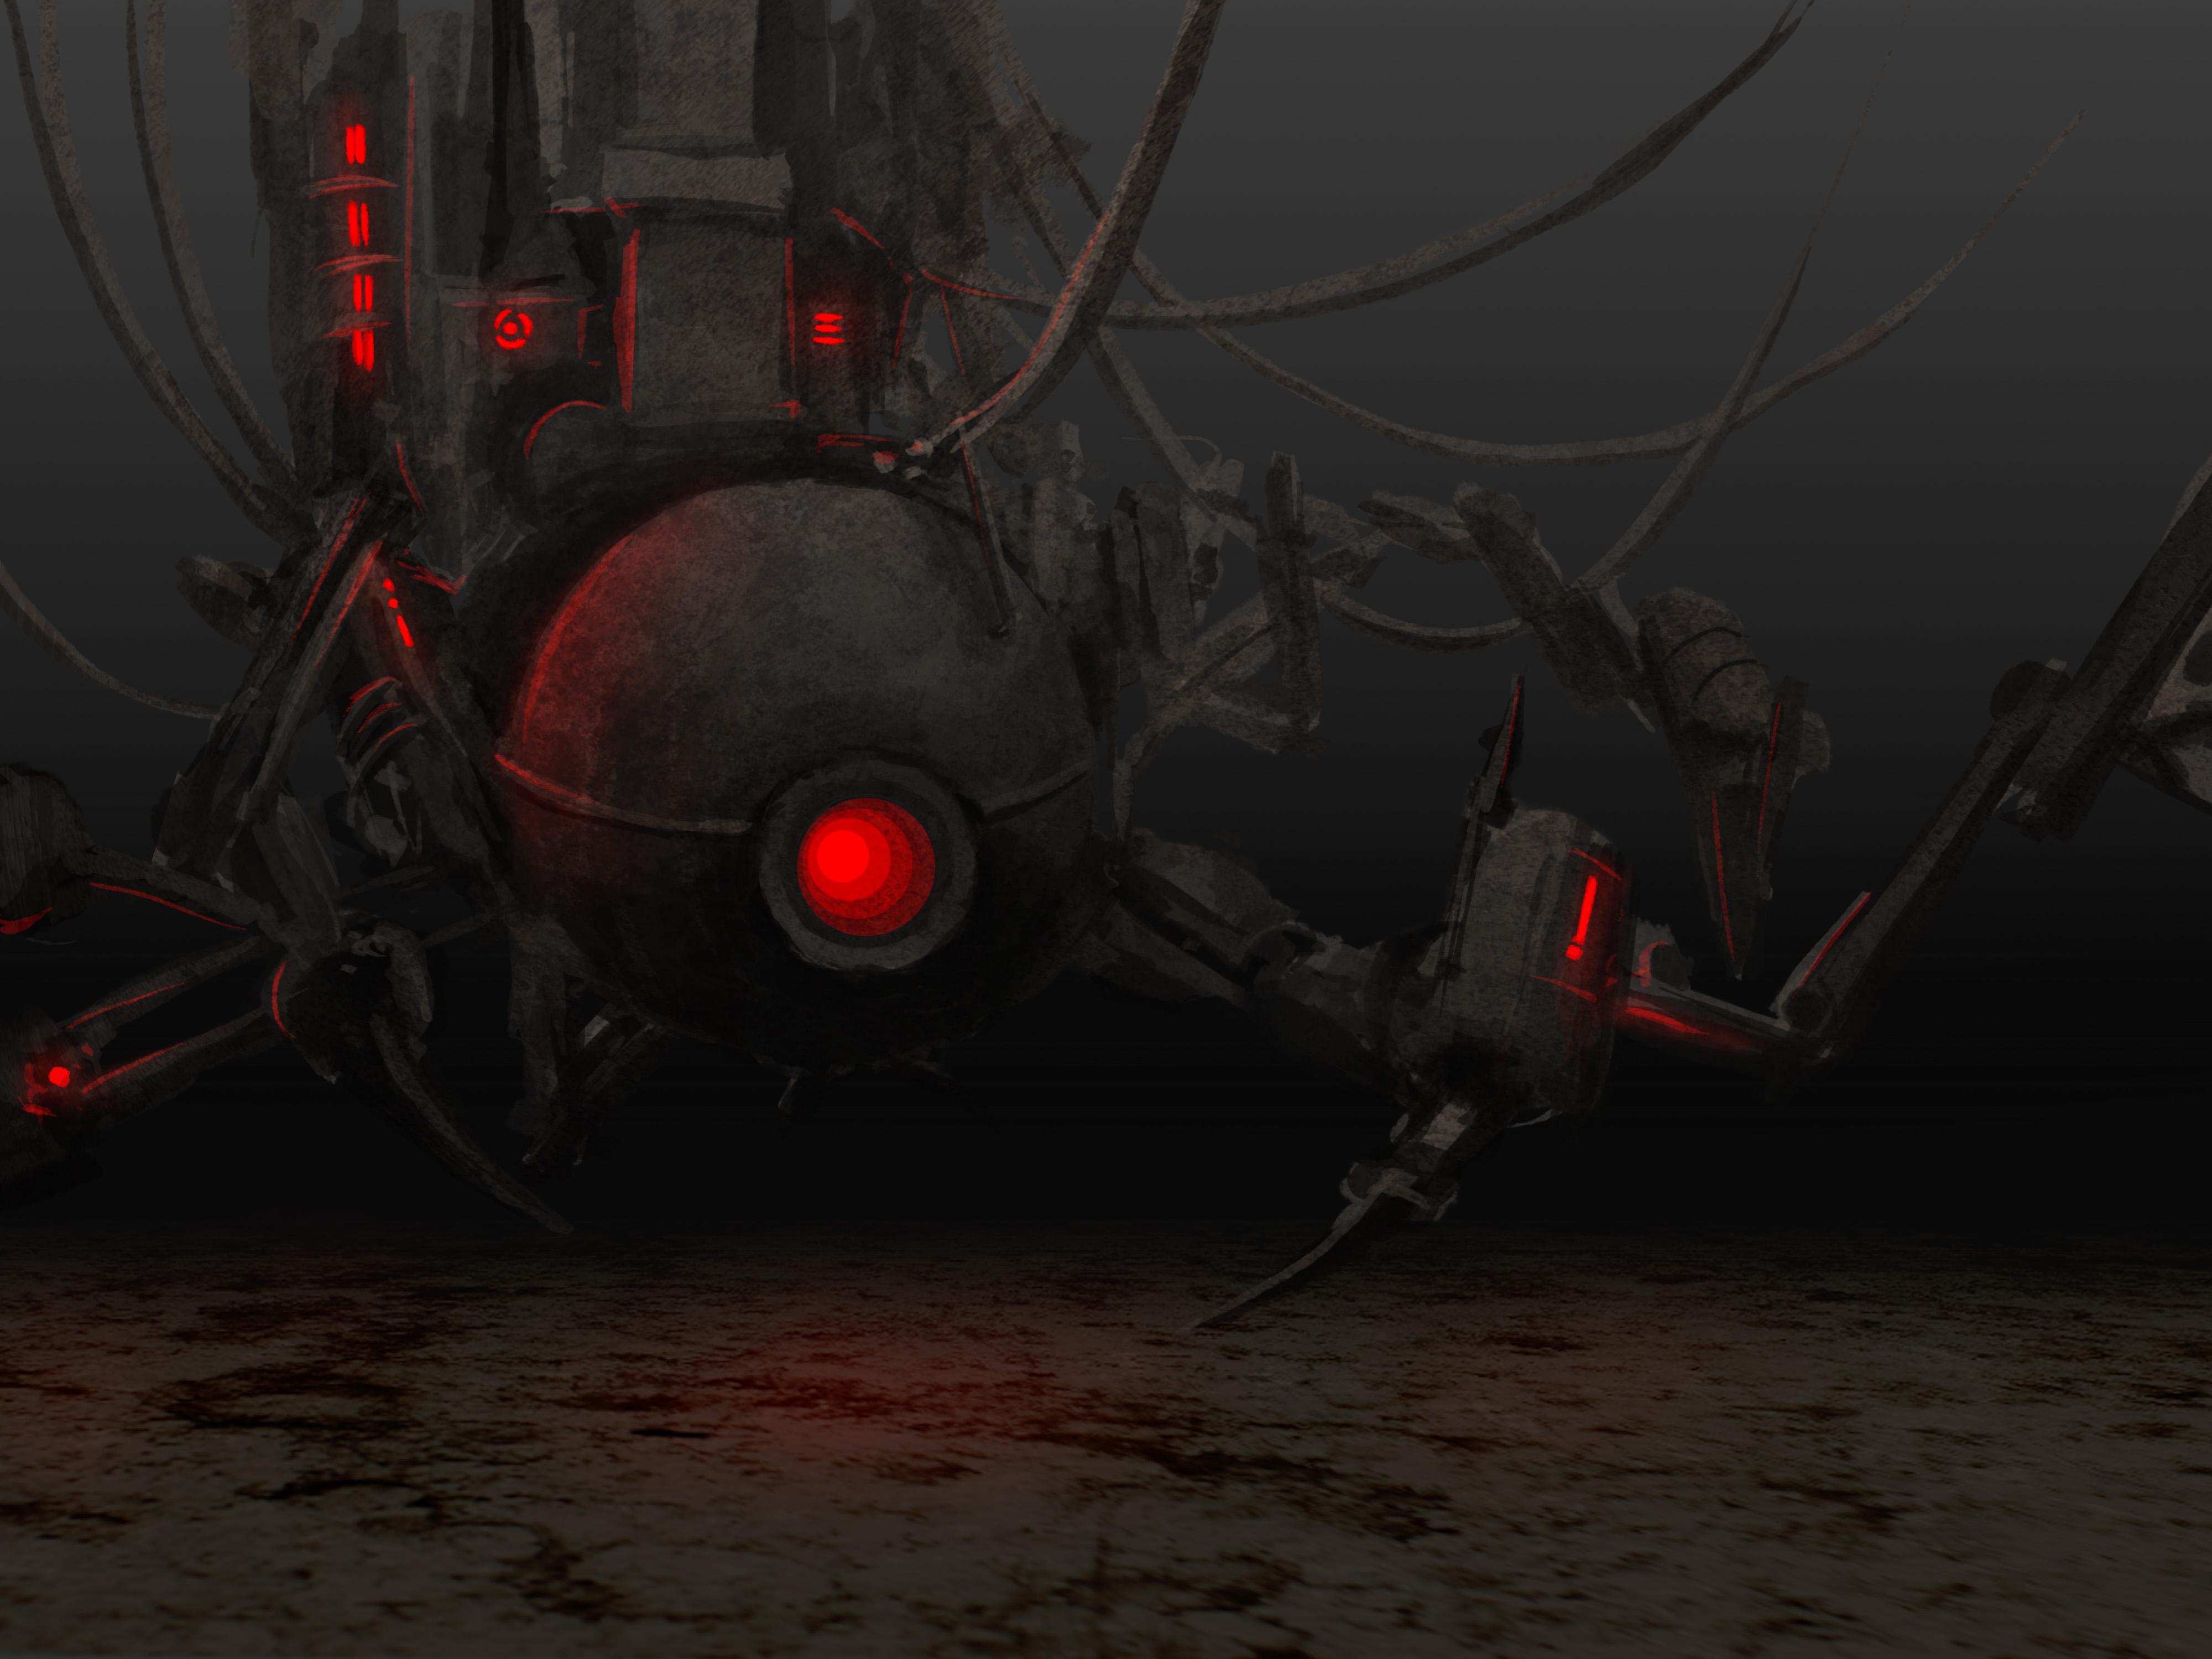 evil machine